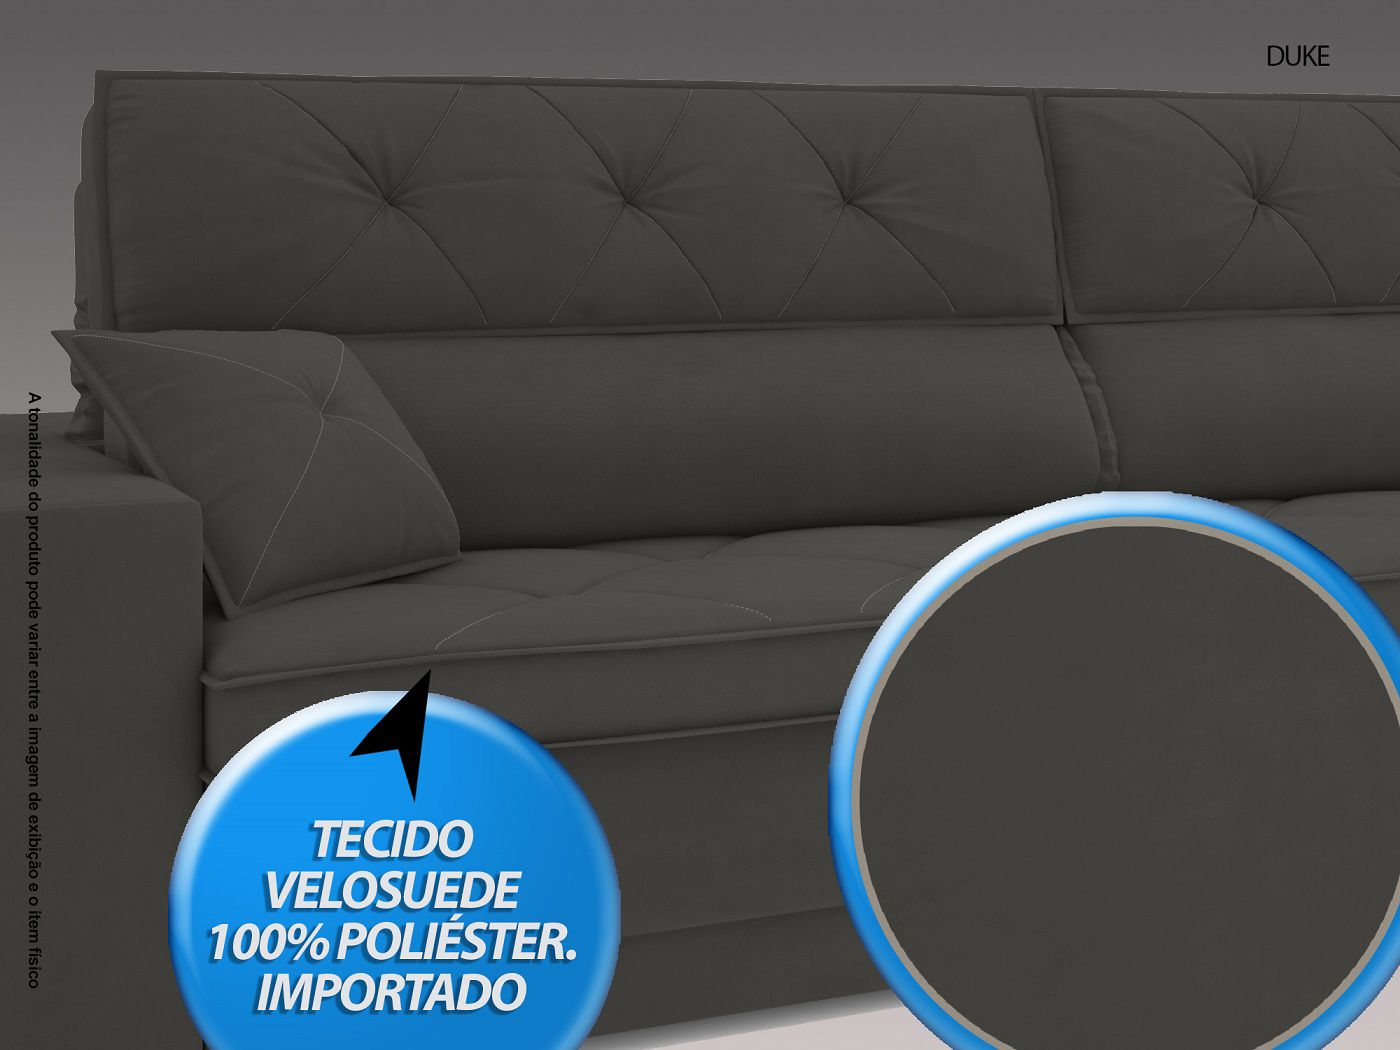 Sofá Duke 2,10m Retrátil e Reclinável Velosuede Cinza - NETSOFAS